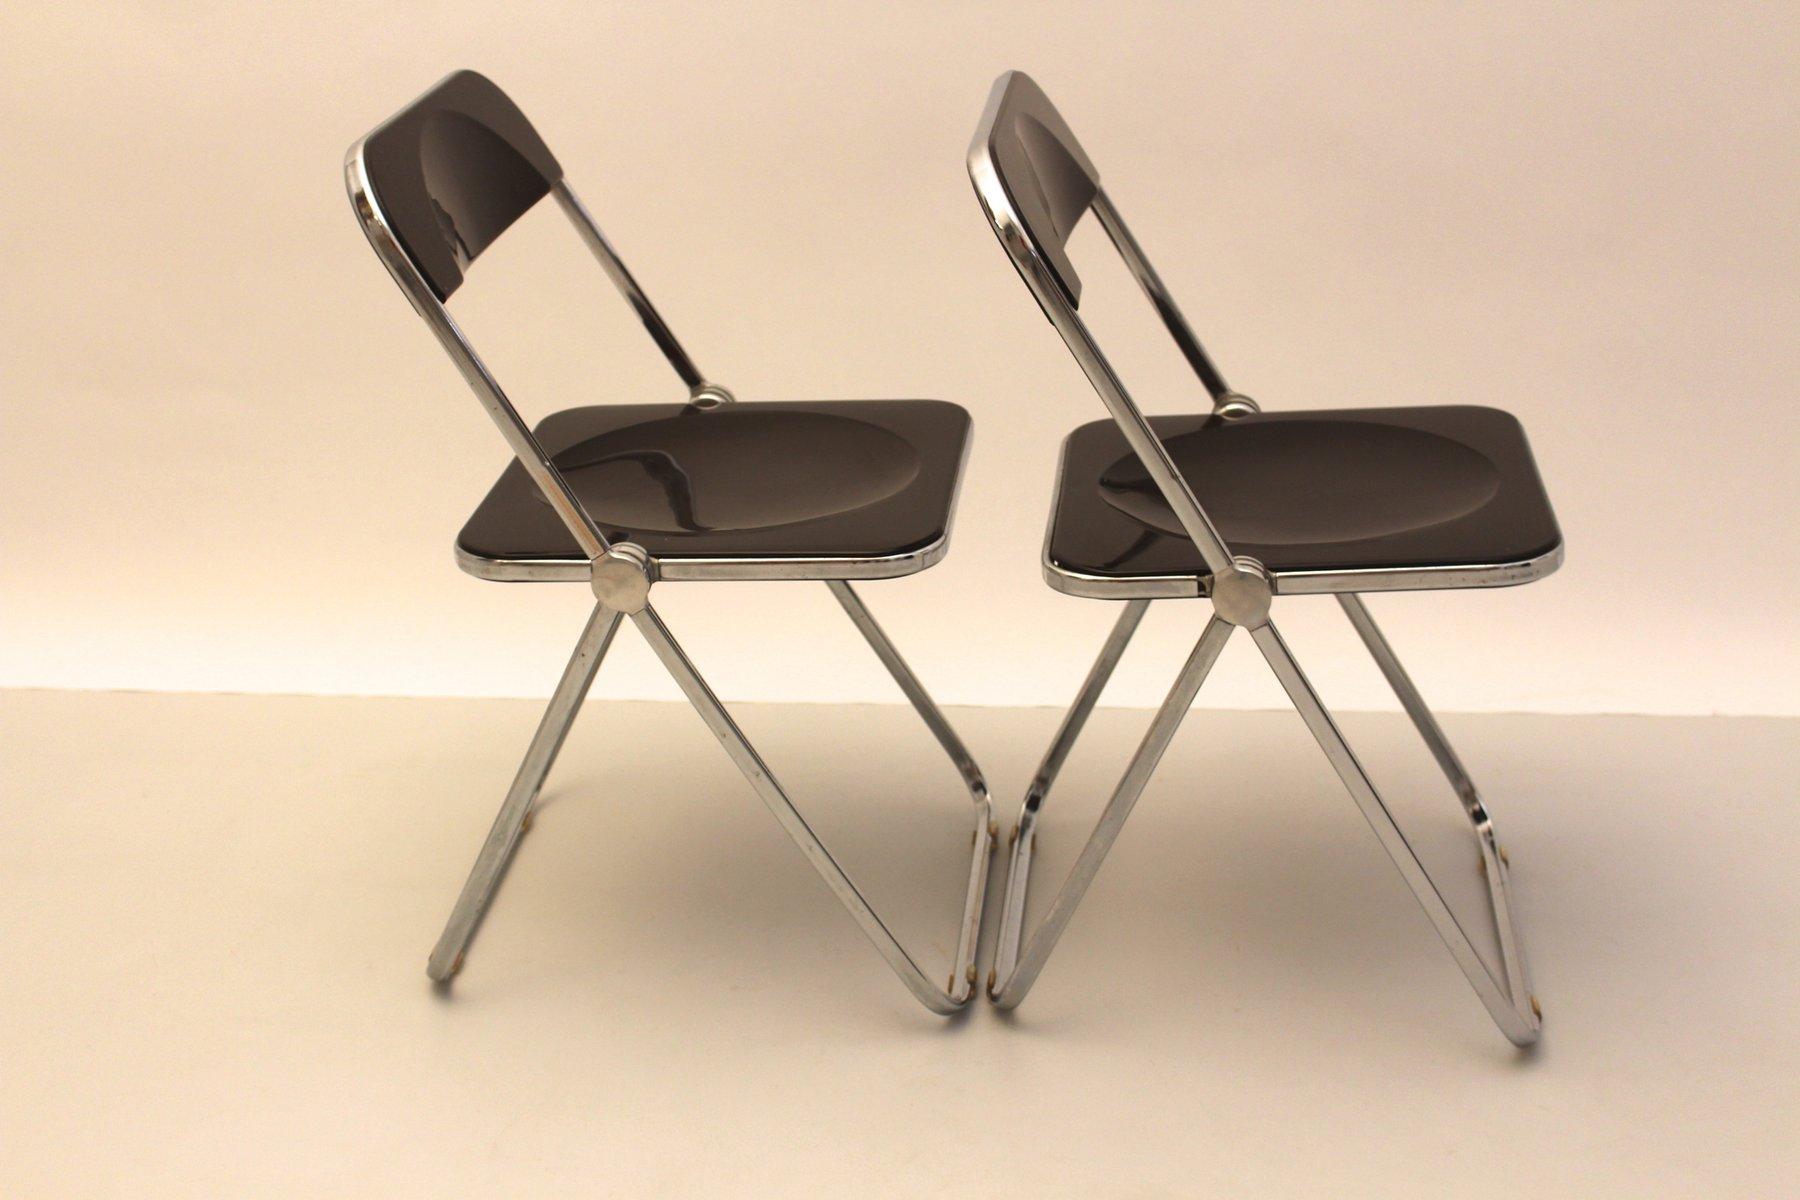 Italian Plia Folding Chairs by Gian Carlo Piretti for Anonima